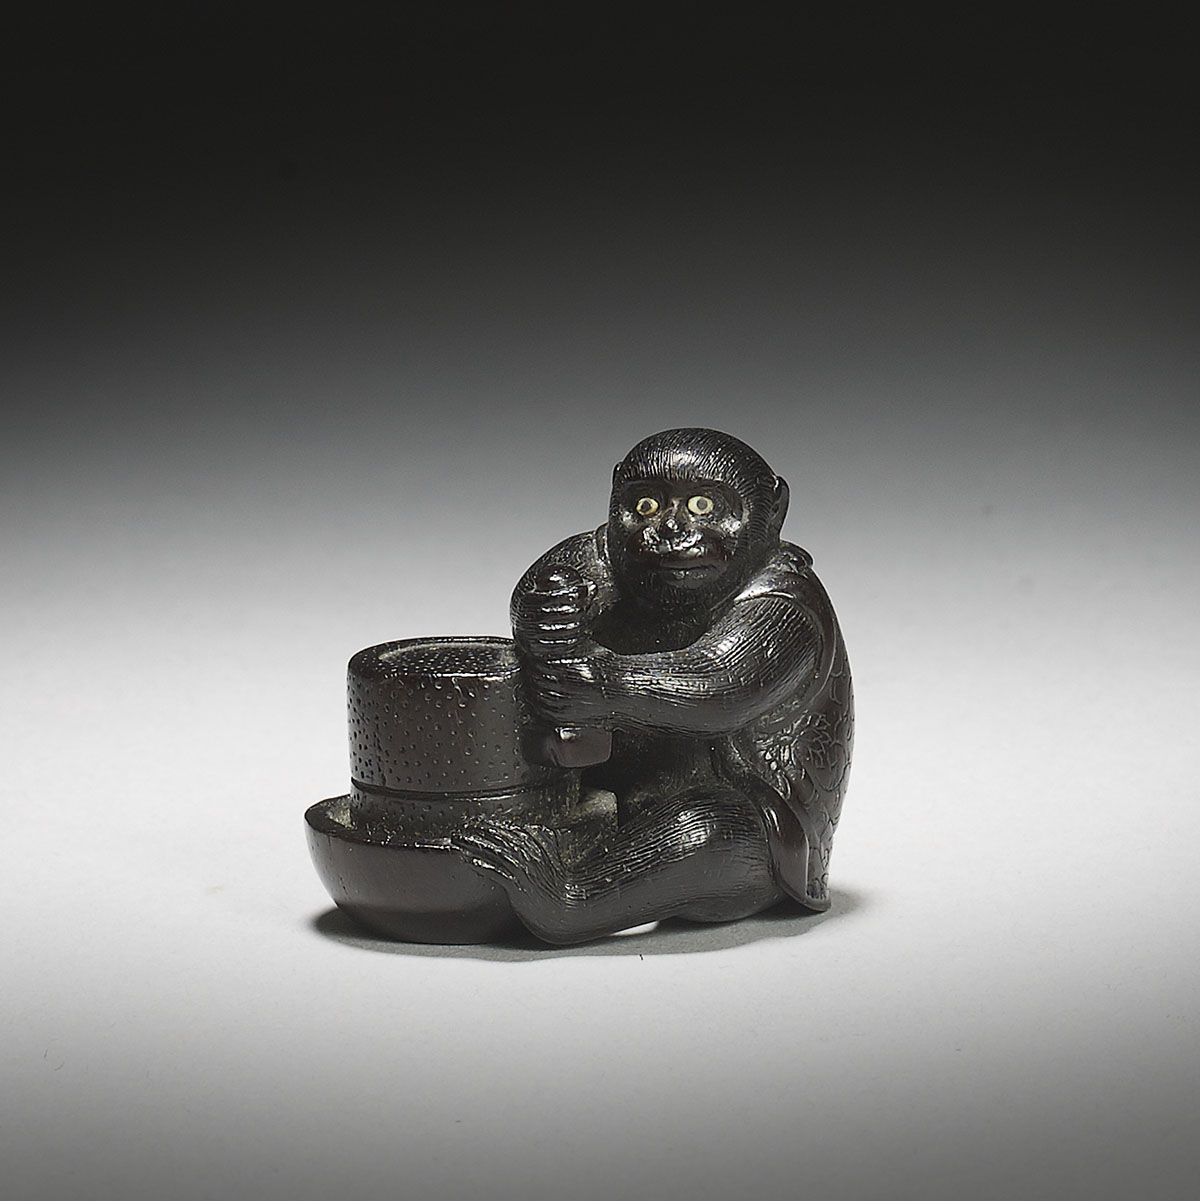 Shitan wood netsuke of a monkey, Okatomo, MR2957_v1